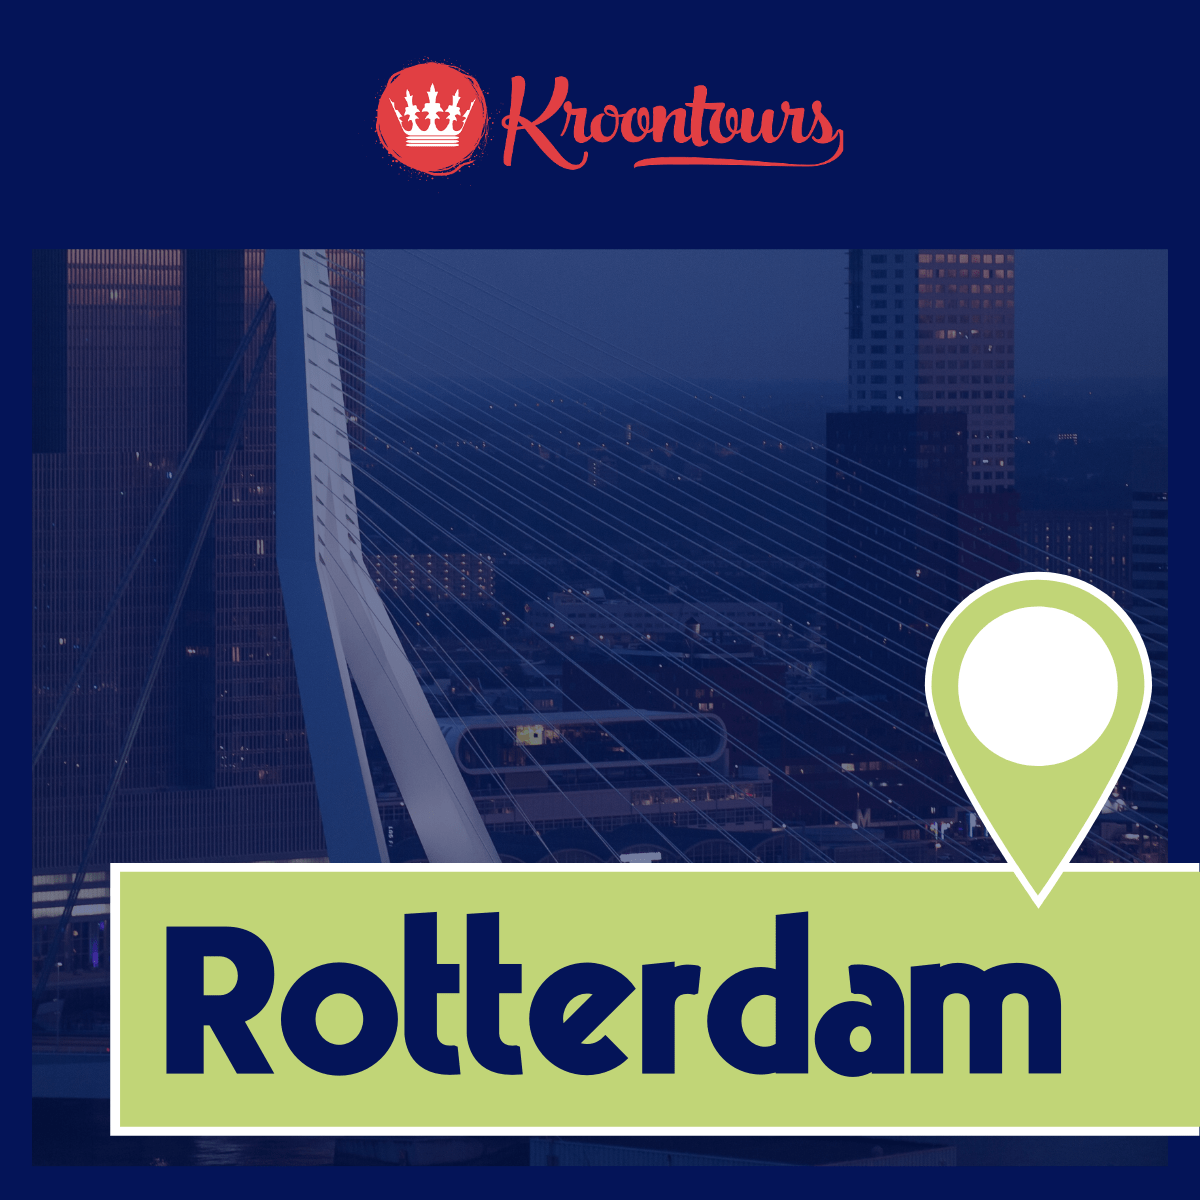 Kroontours in Rotterdam